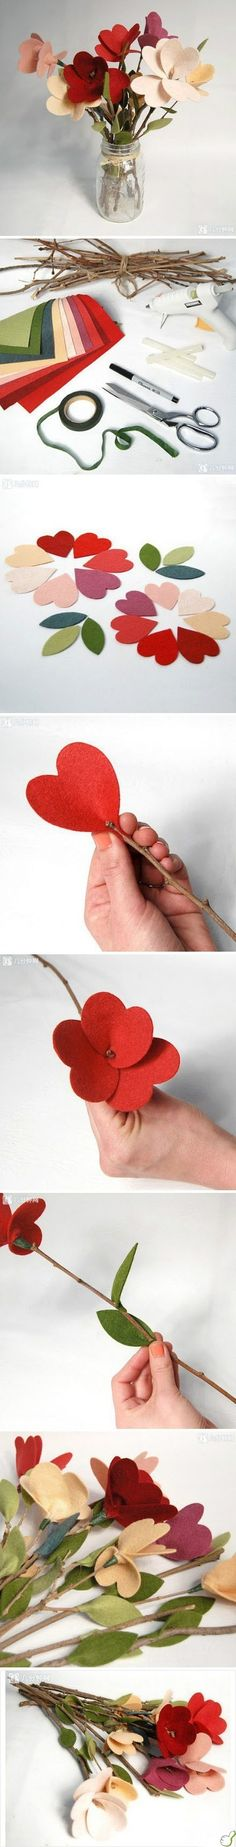 Felt or paper flowers